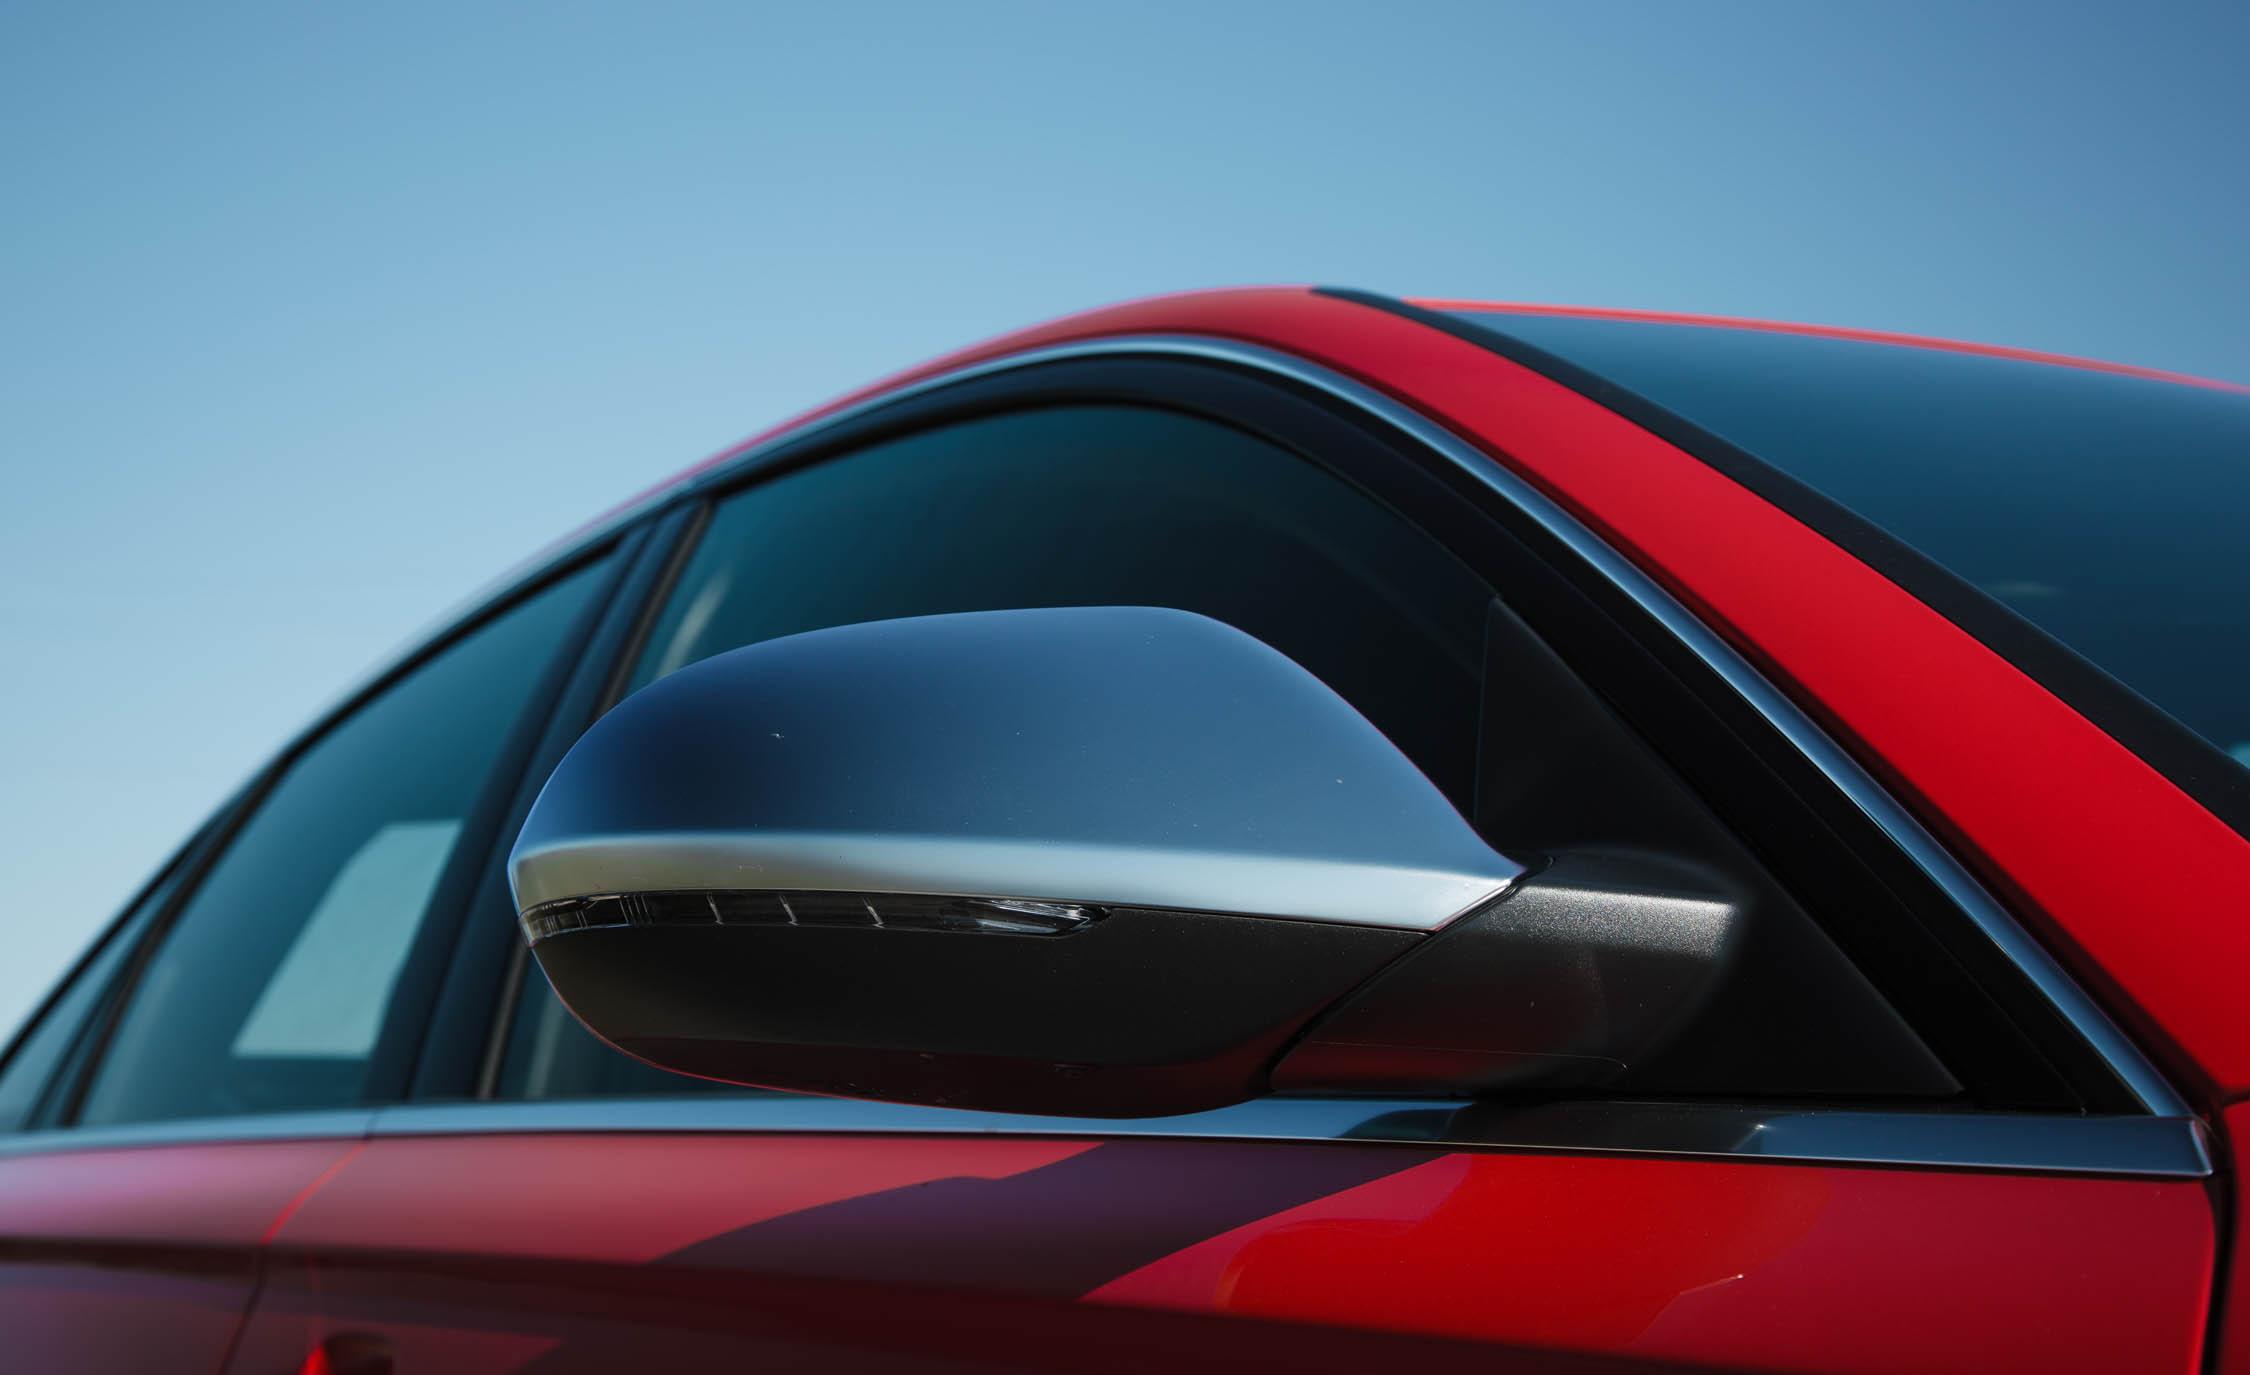 2016 Audi S6 Exterior Side Mirror